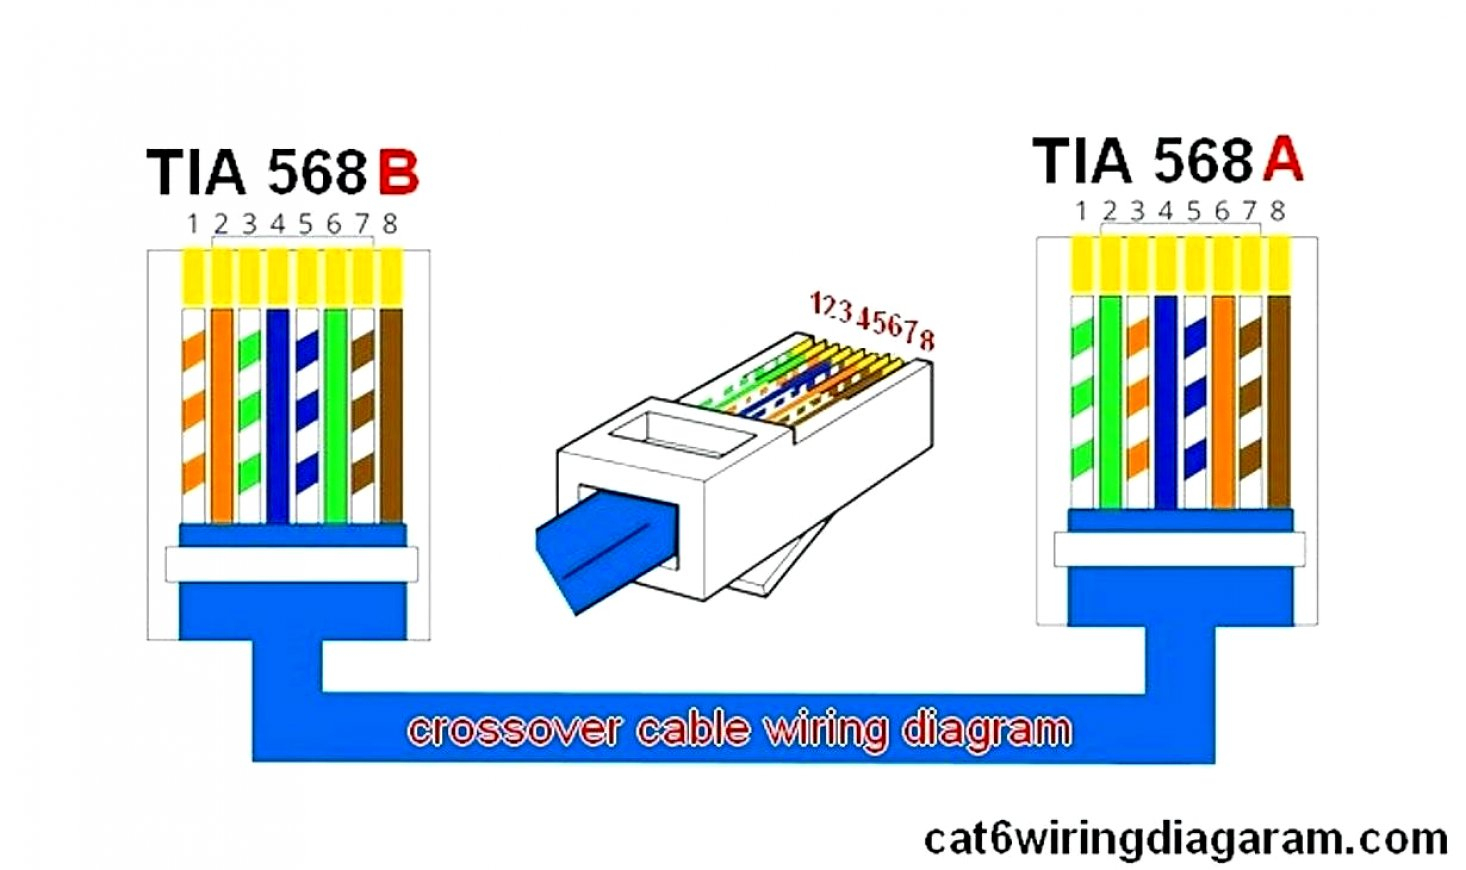 Cat 5 Ethernet Wire Diagram - Wiring Diagram Data - Ethernet Cable Wiring Diagram